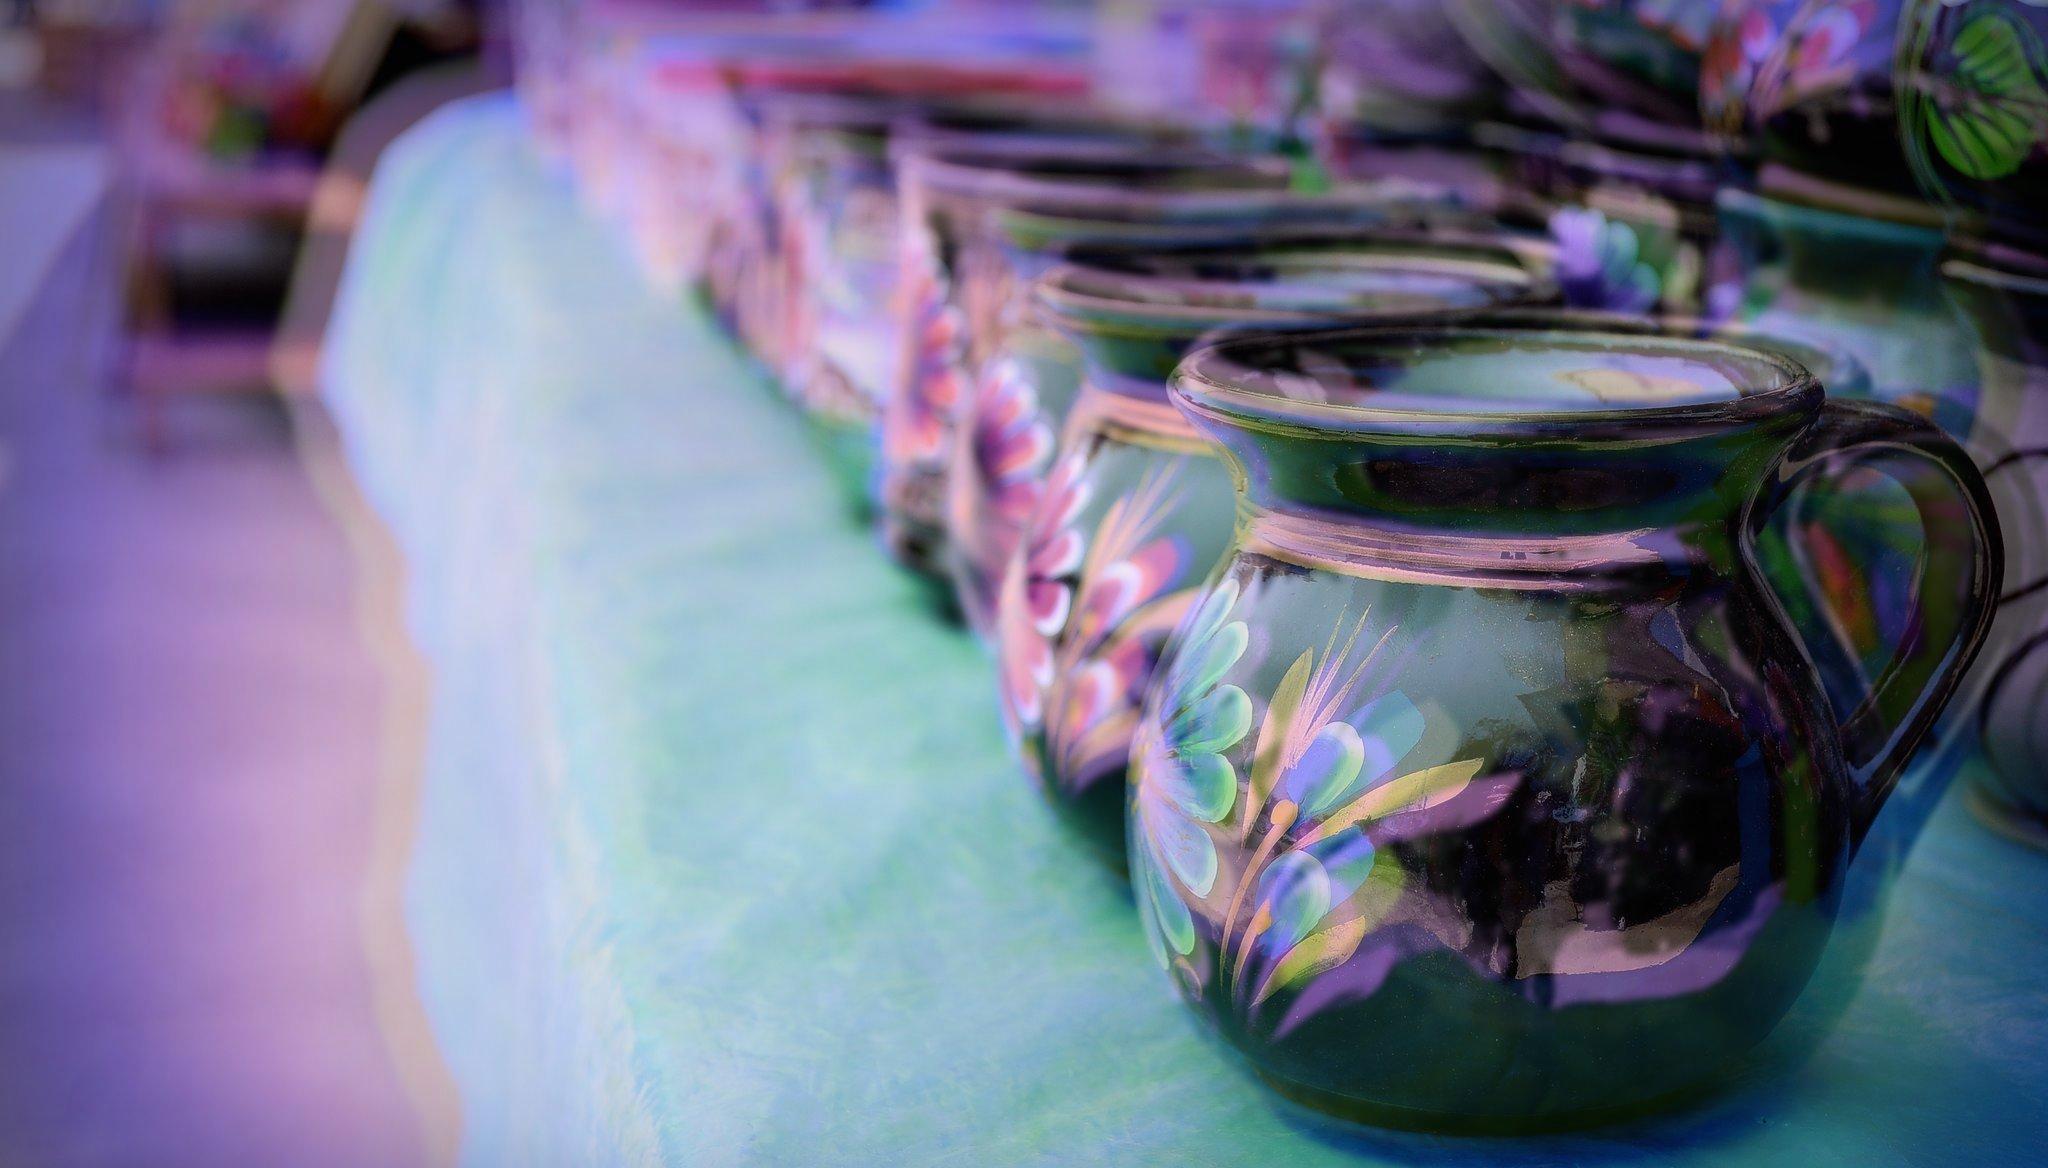 mexico-artesanias-artesanos-comprar-regatear-consumo-justo-responsable